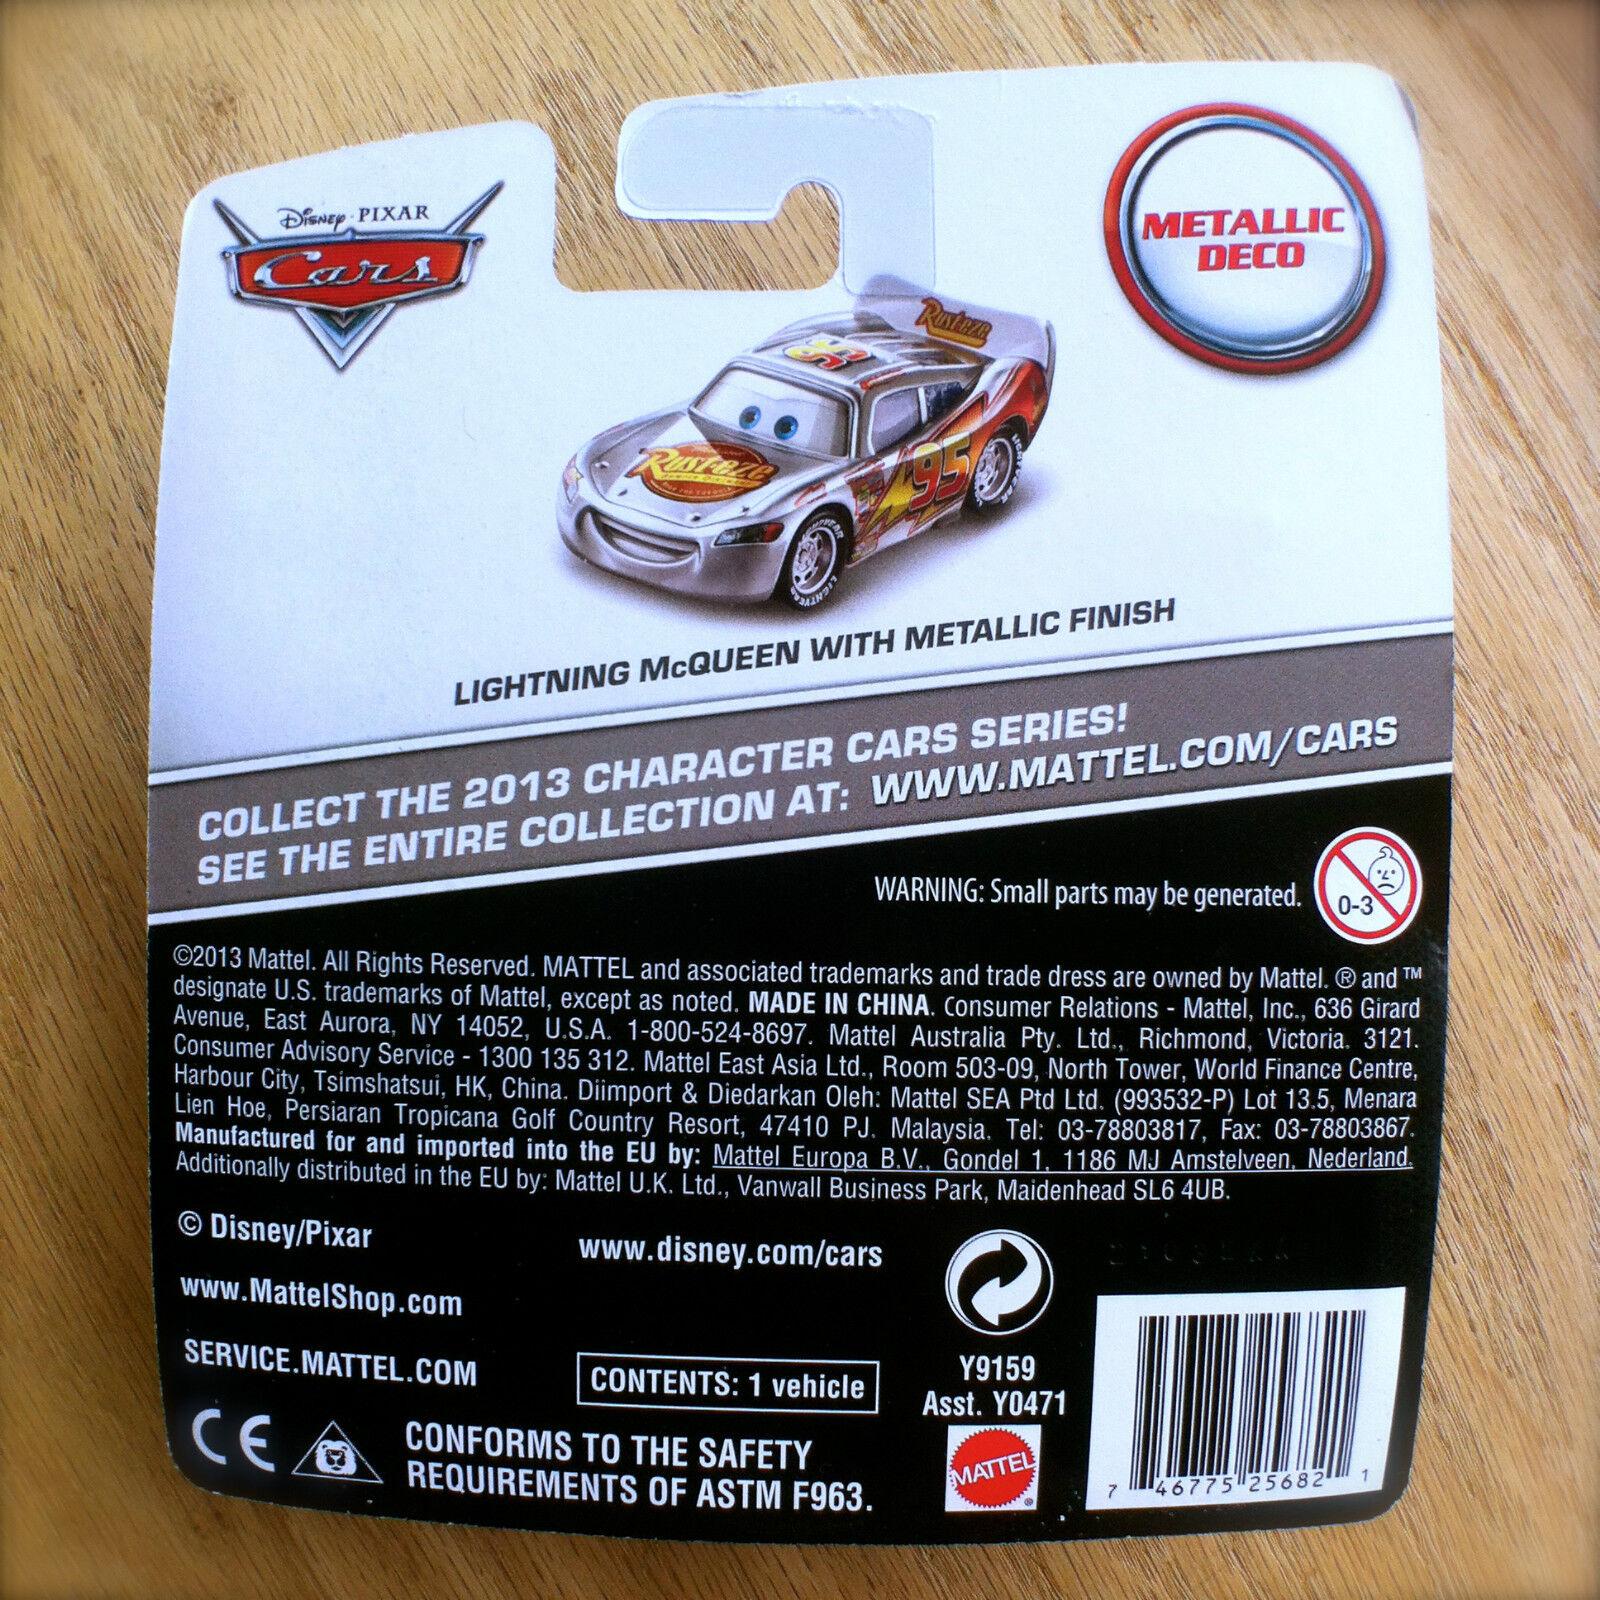 disney pixar cars lightning mcqueen w metallic finish silver deco